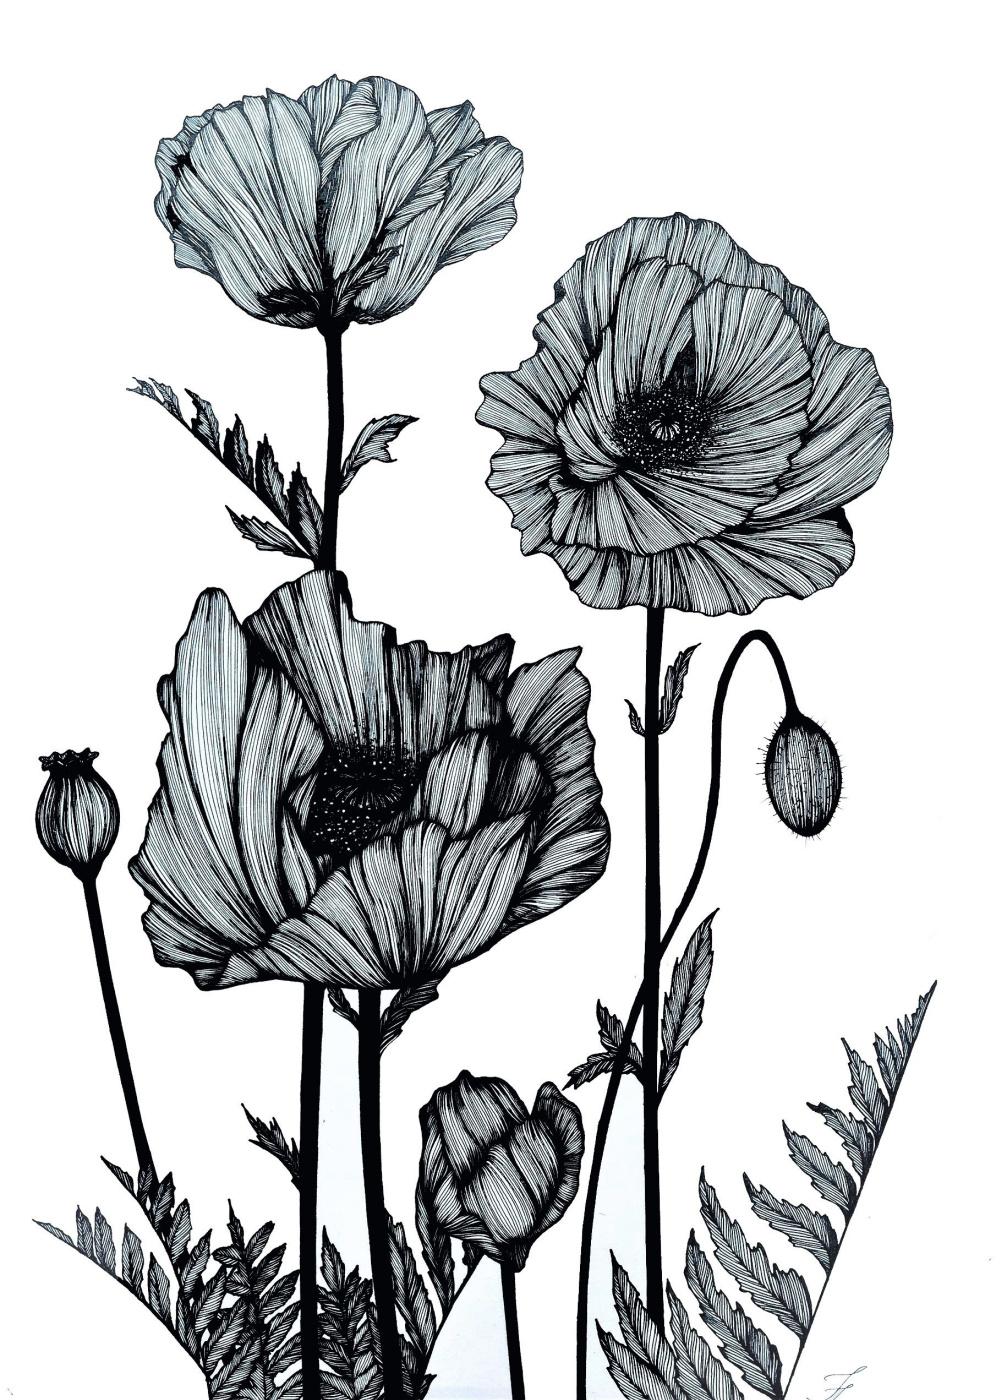 Julia Alekseevna Faberge. Poppies